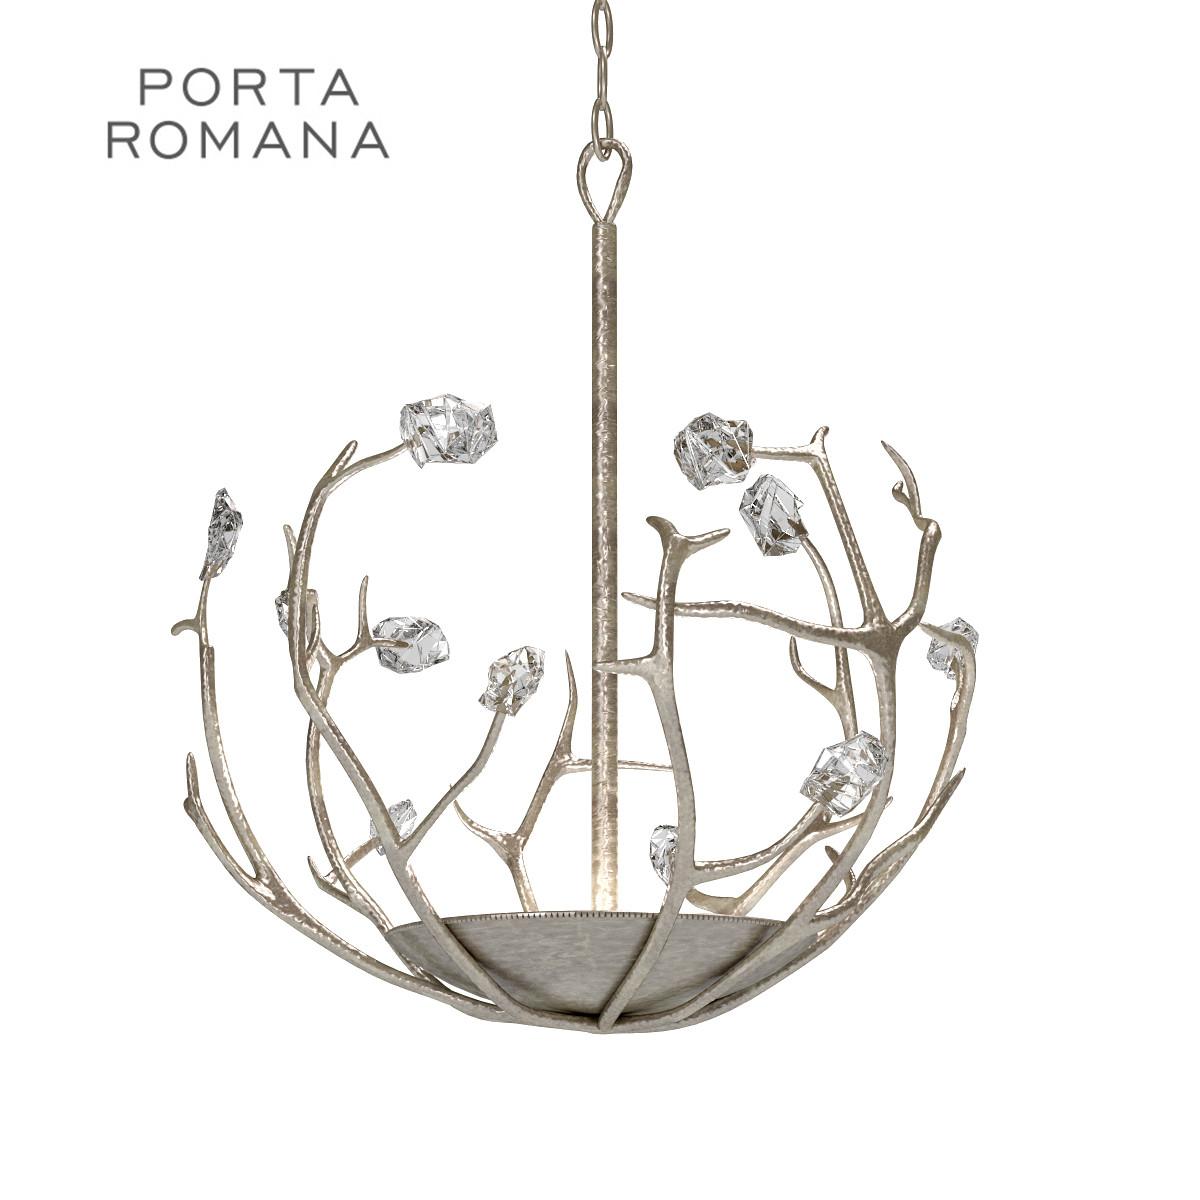 Porta_Romana_Blossom_Chandelier_H740x600_1.jpg